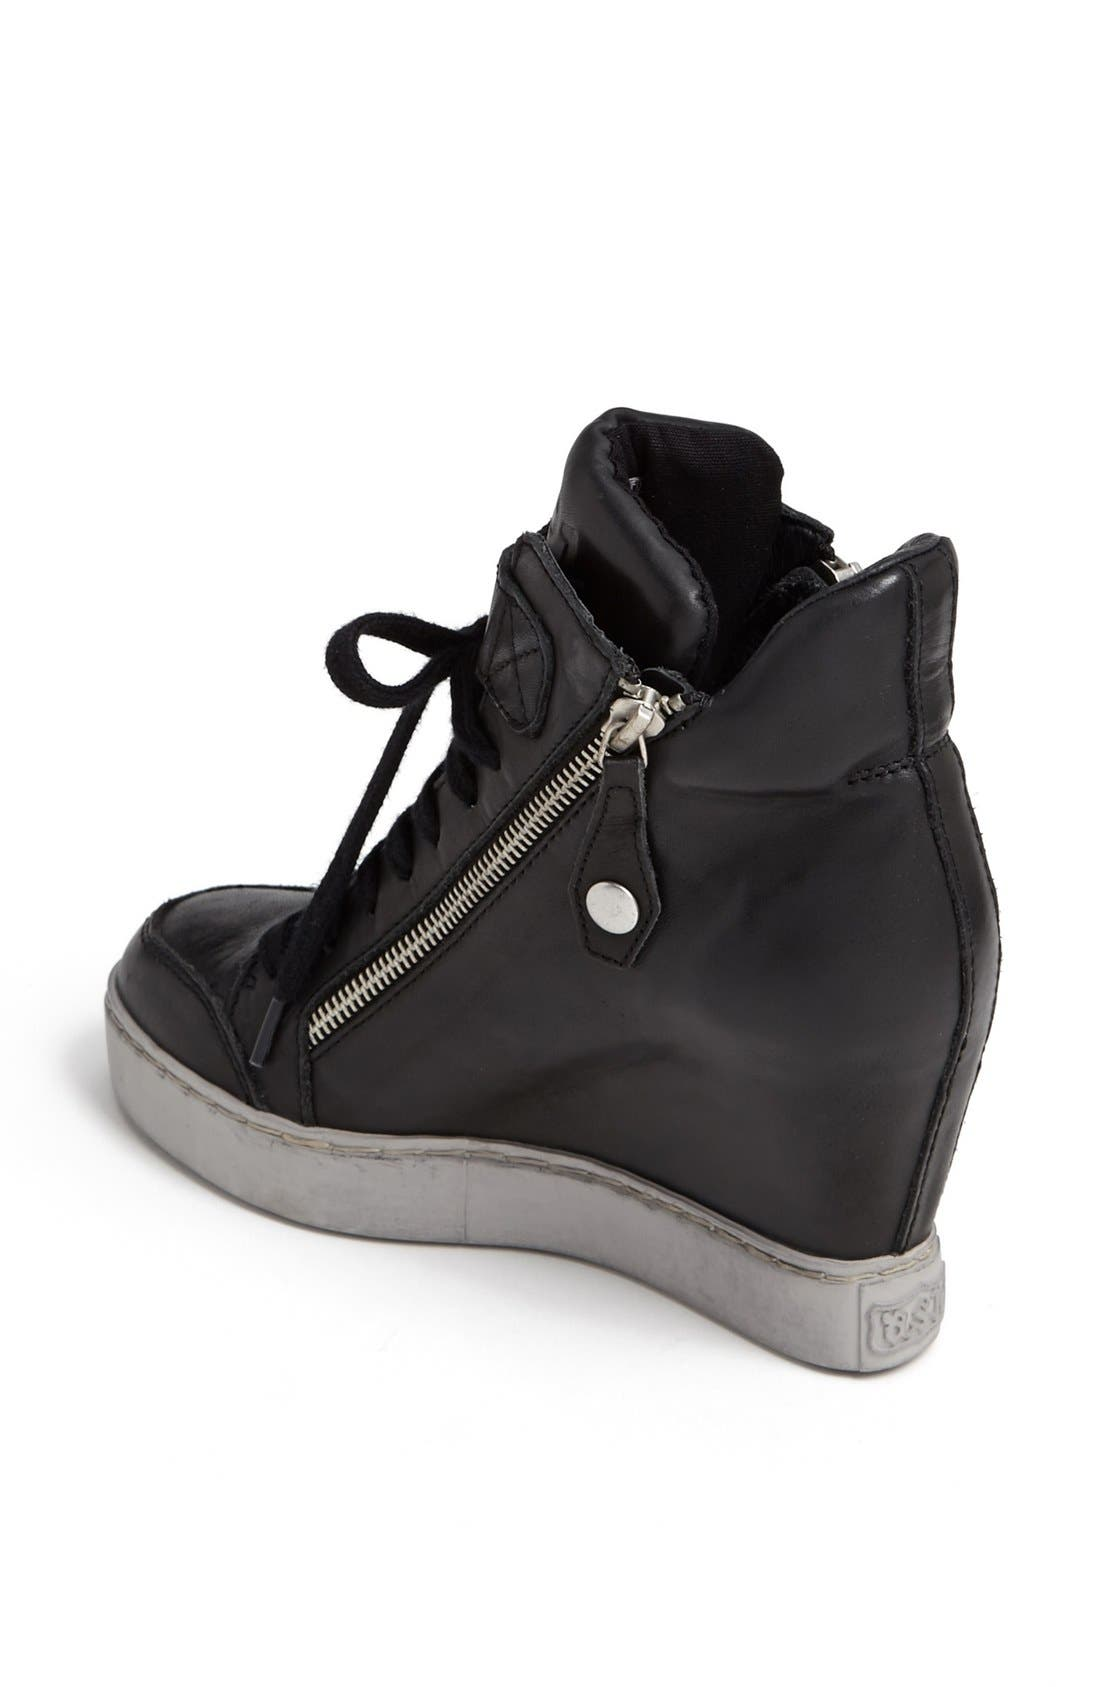 Alternate Image 2  - Ash 'Body' Wedge Sneaker